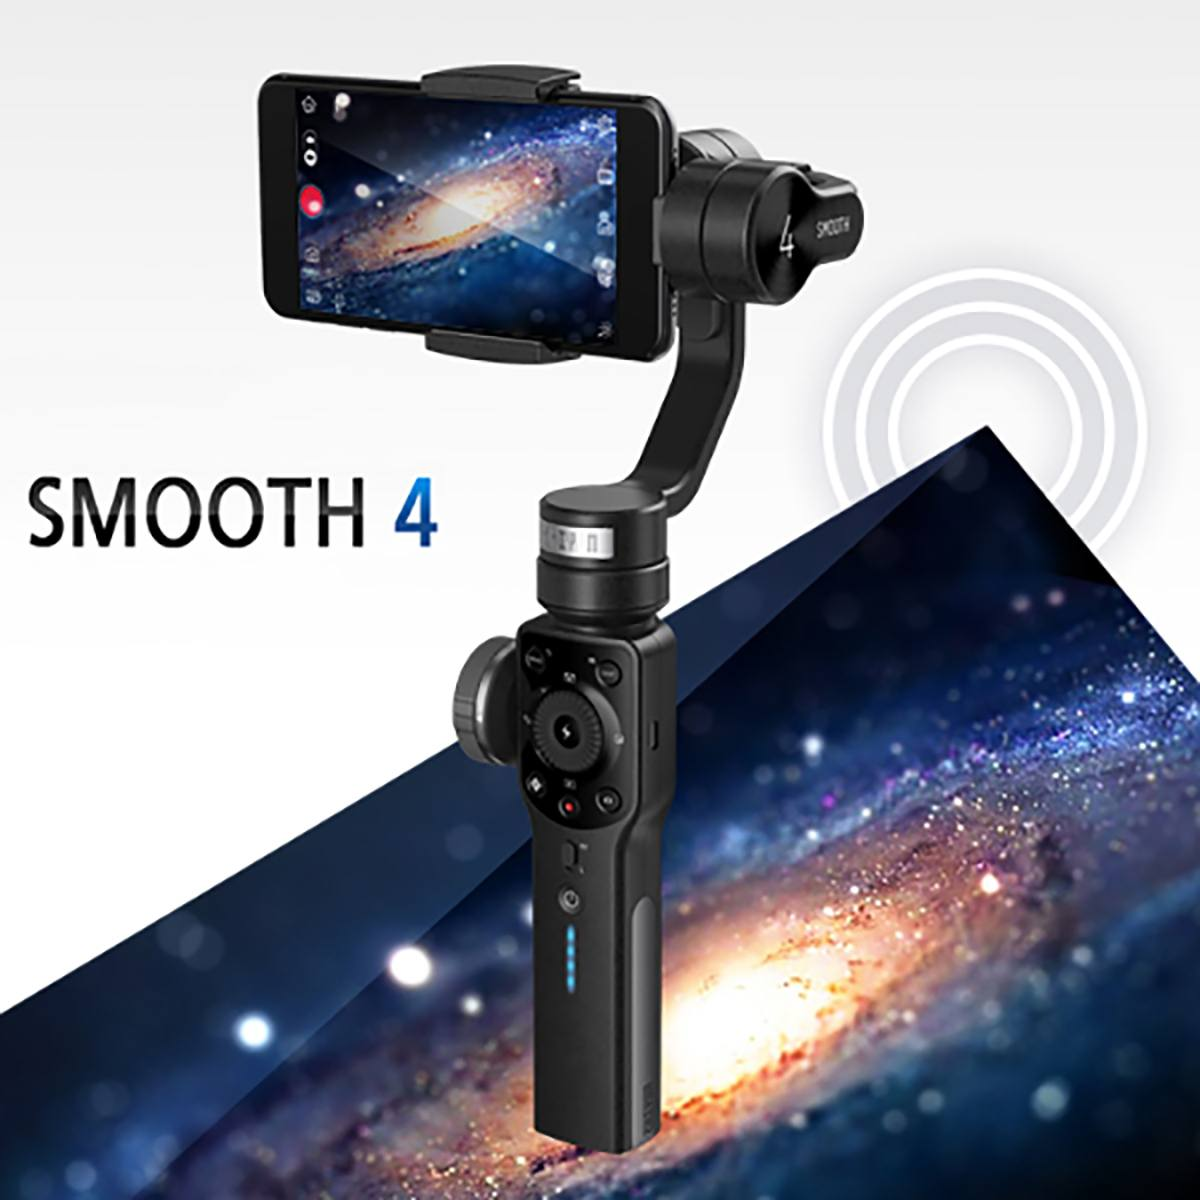 Zhiyun suave 4 sem escova 3 eixos cardan handheld estabilizador smartphone cardan para iphone para samsung todos os telefones vídeo foto